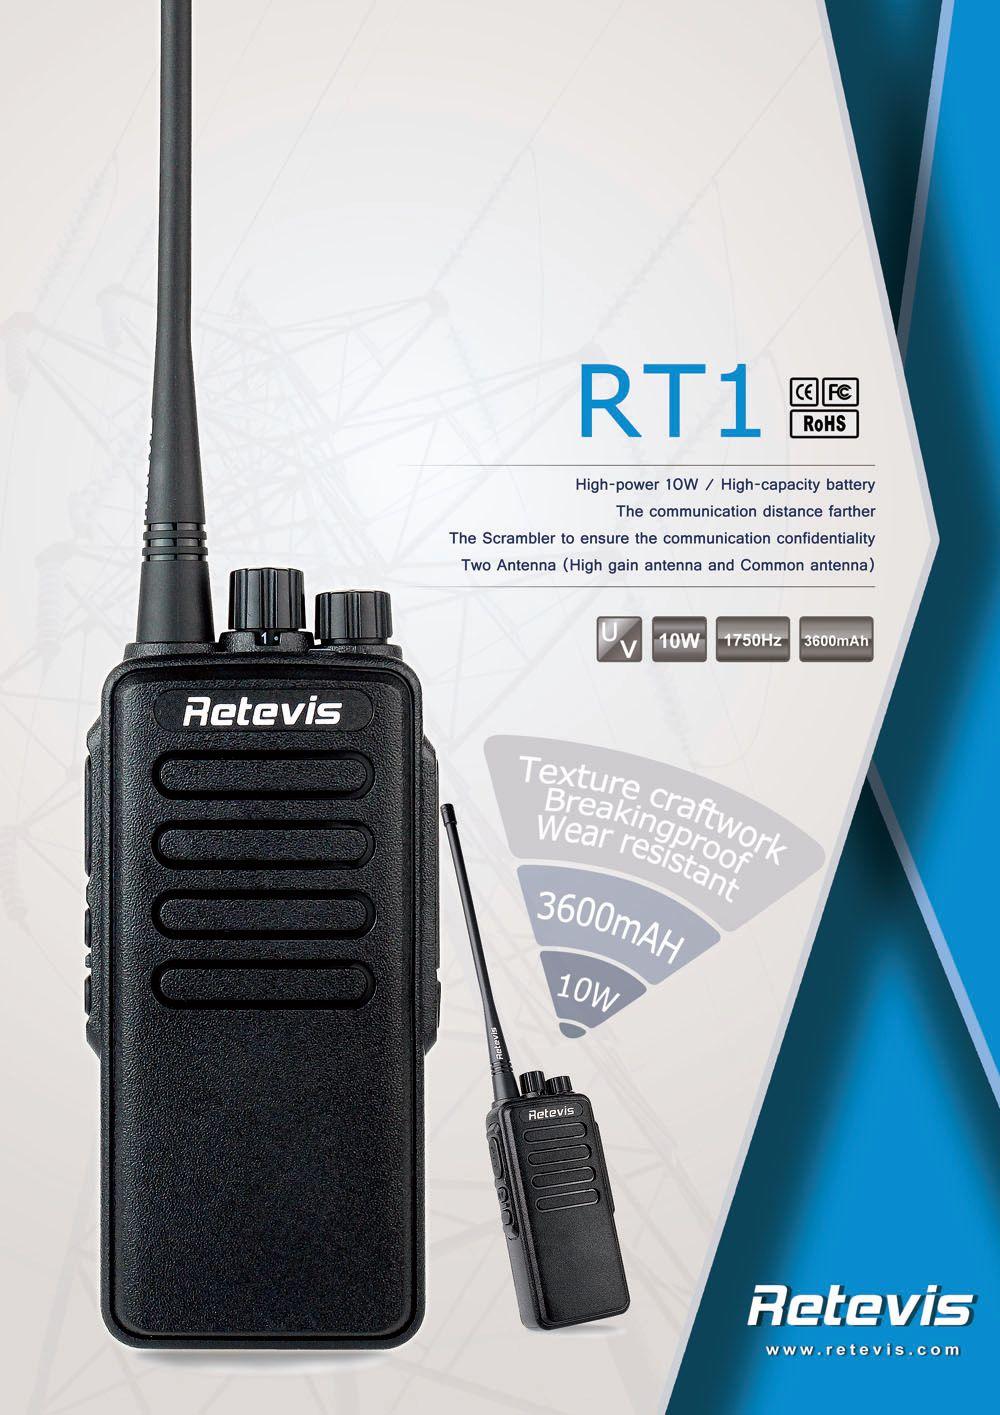 RETEVIS RT1 10W Walkie Talkie VHF136-174 MHz  Scrambler 1750Hz Two Way Radio New